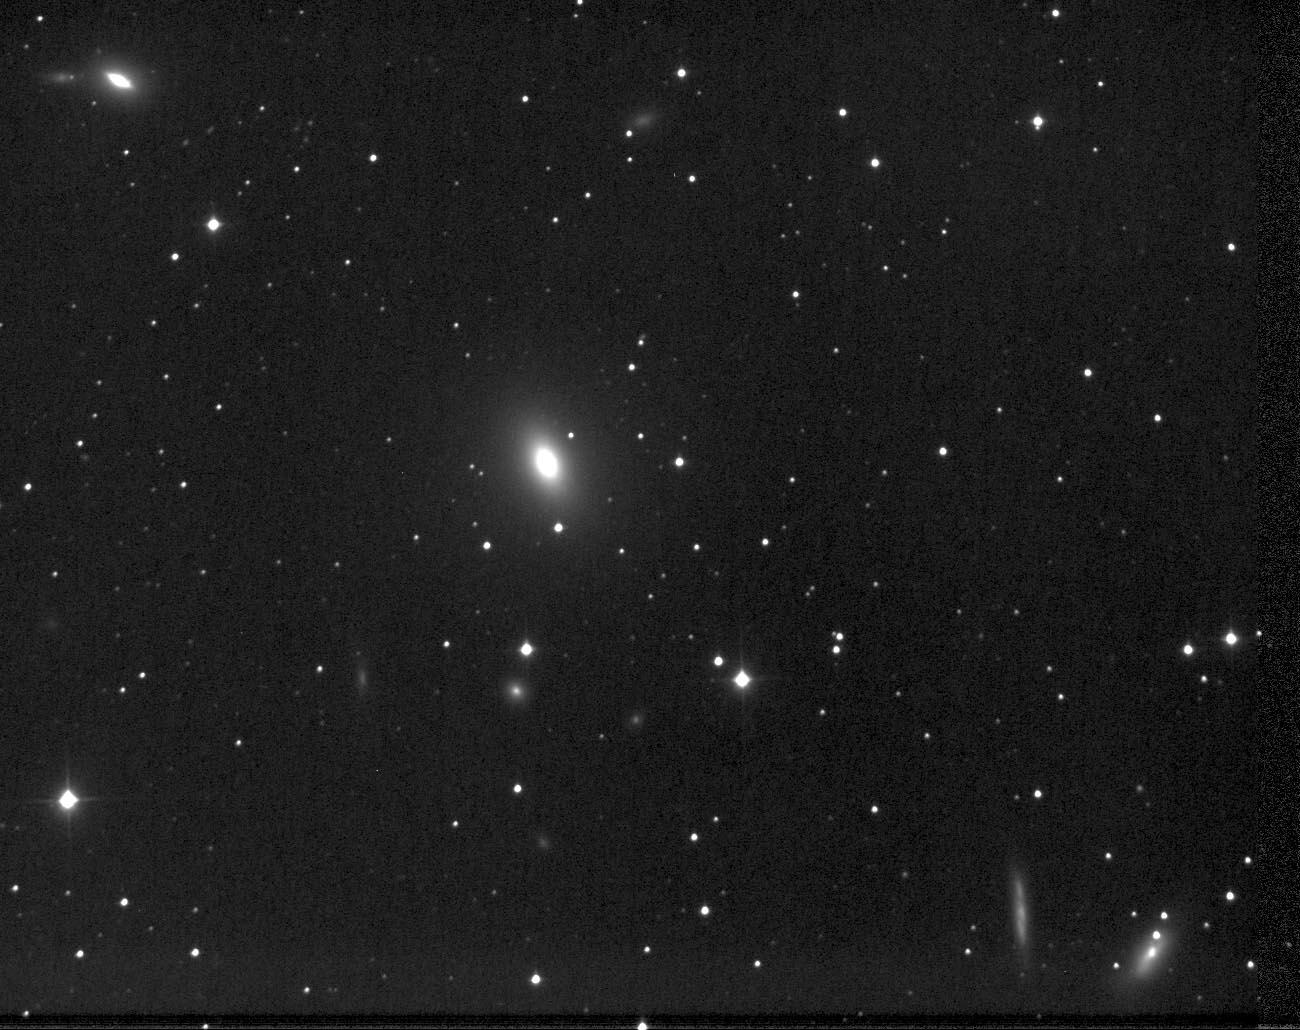 Orange Logic - Elliptical Galaxy M59, NGC 4621